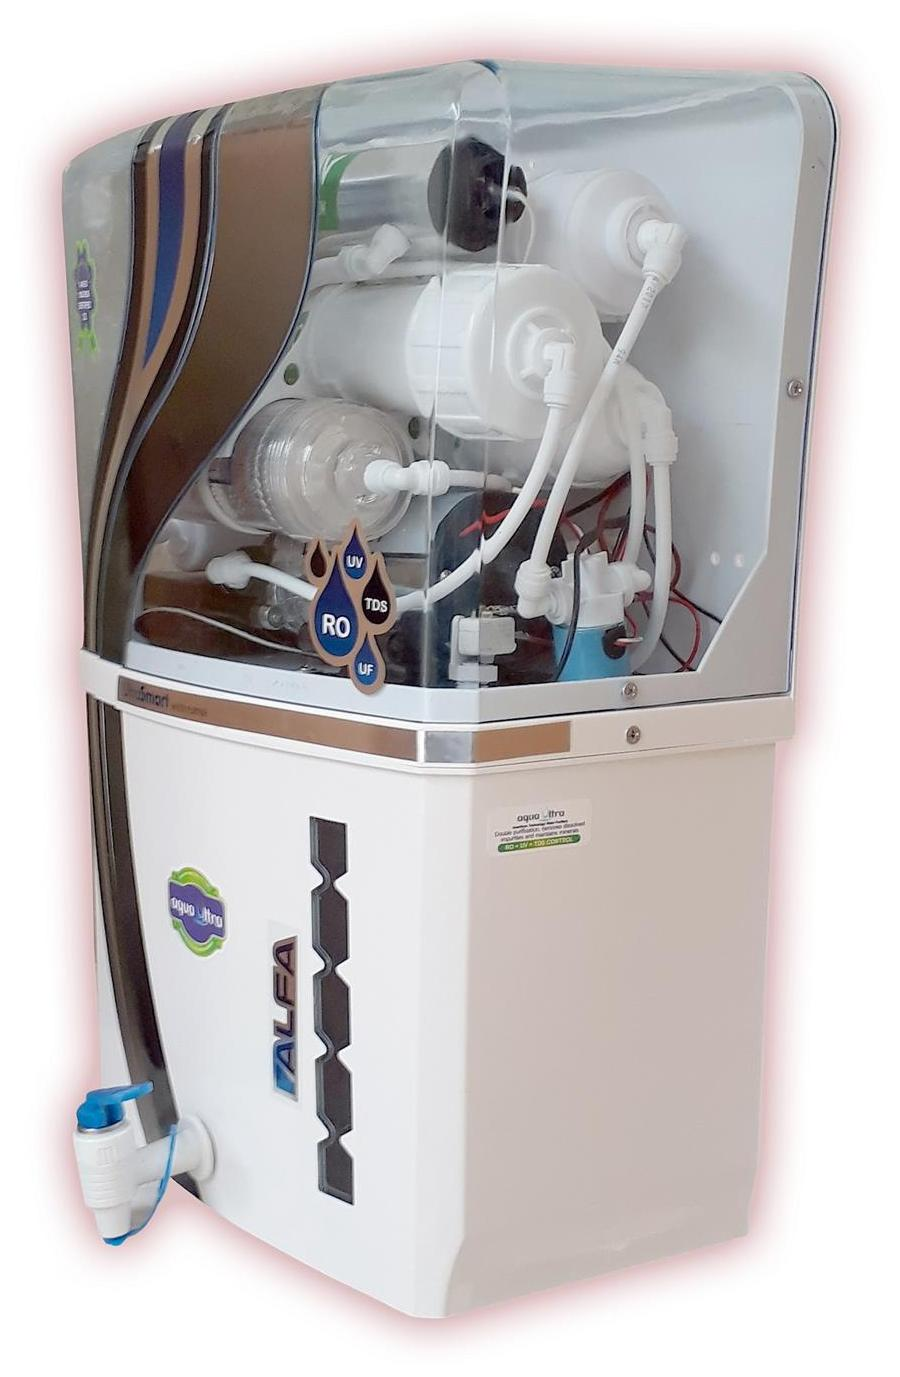 Aqua Ultra A1010 12L RO+UV+UF Water Purifier (White)